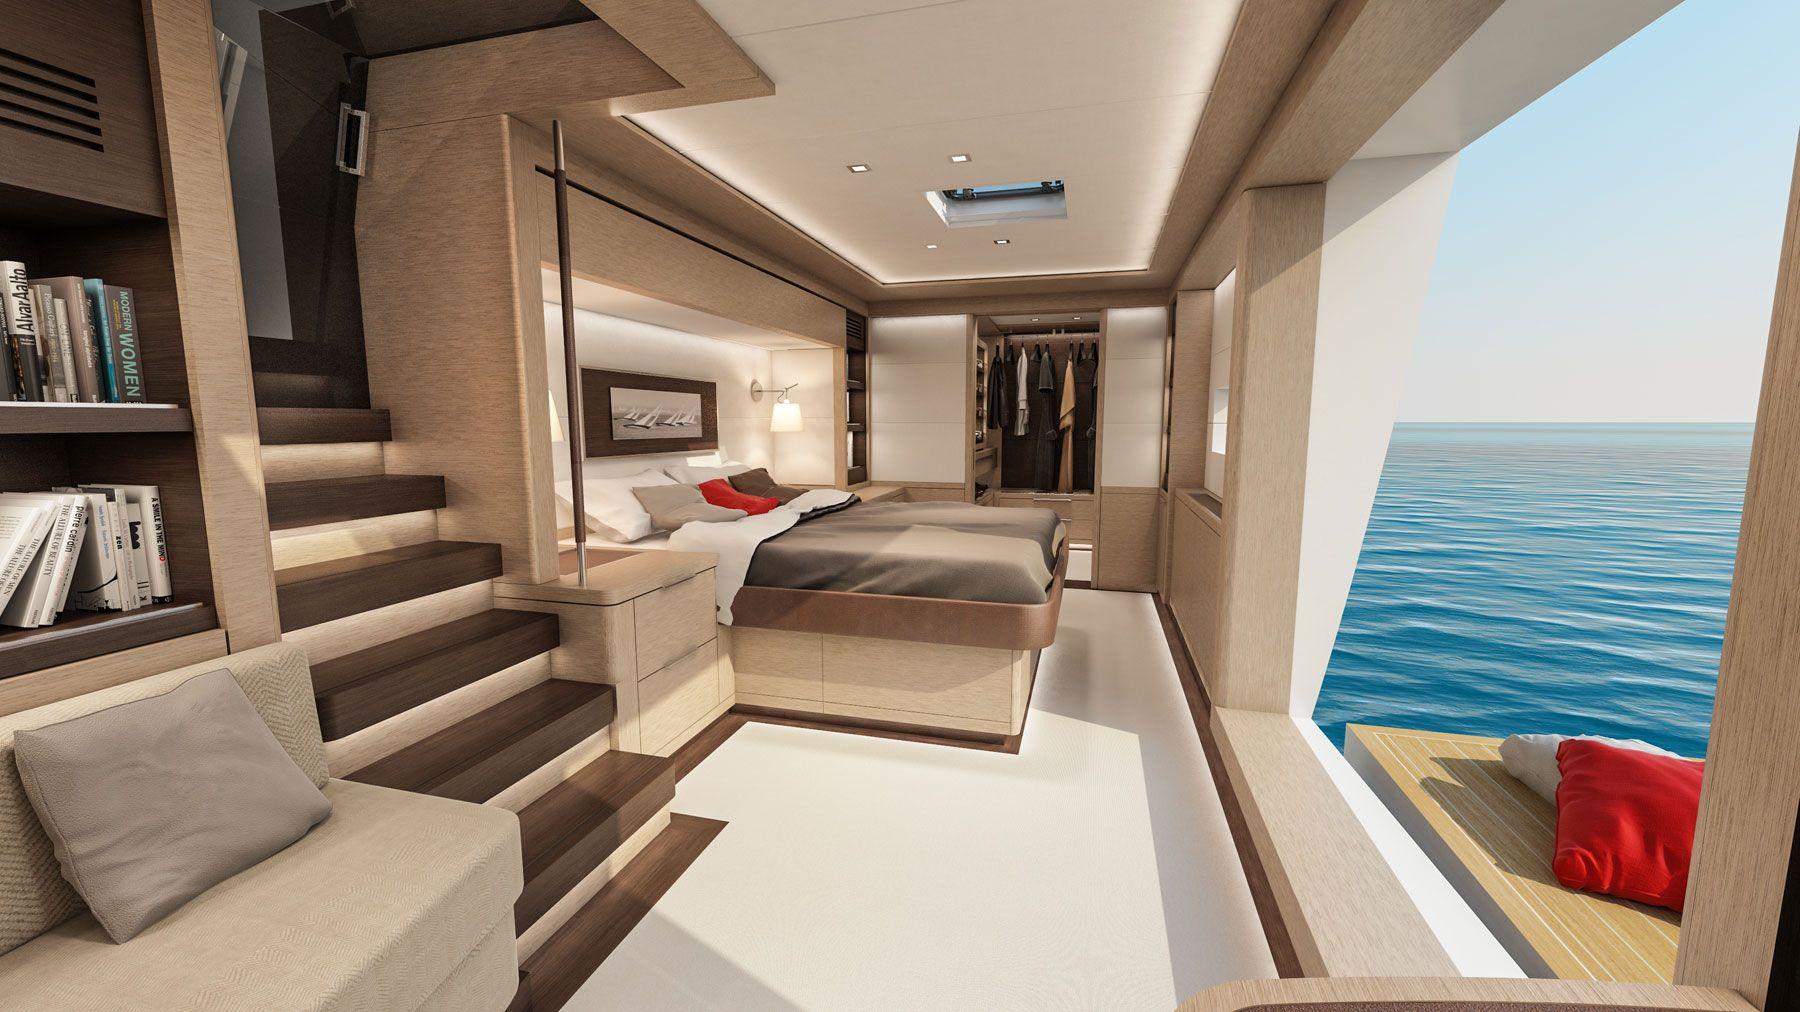 Lagoon Catamarans Catamaran Yacht Interior Design Boats Luxury